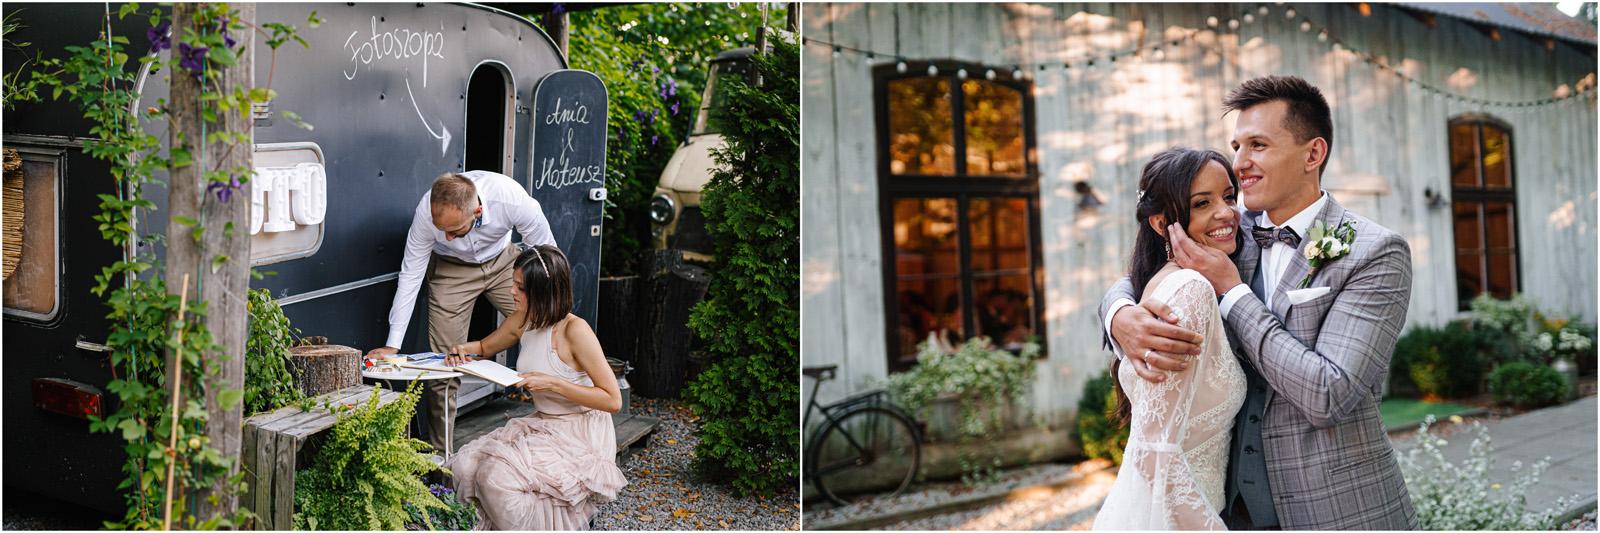 Ania & Mateusz | boho wesele w Stodole pod Kasztanami 102